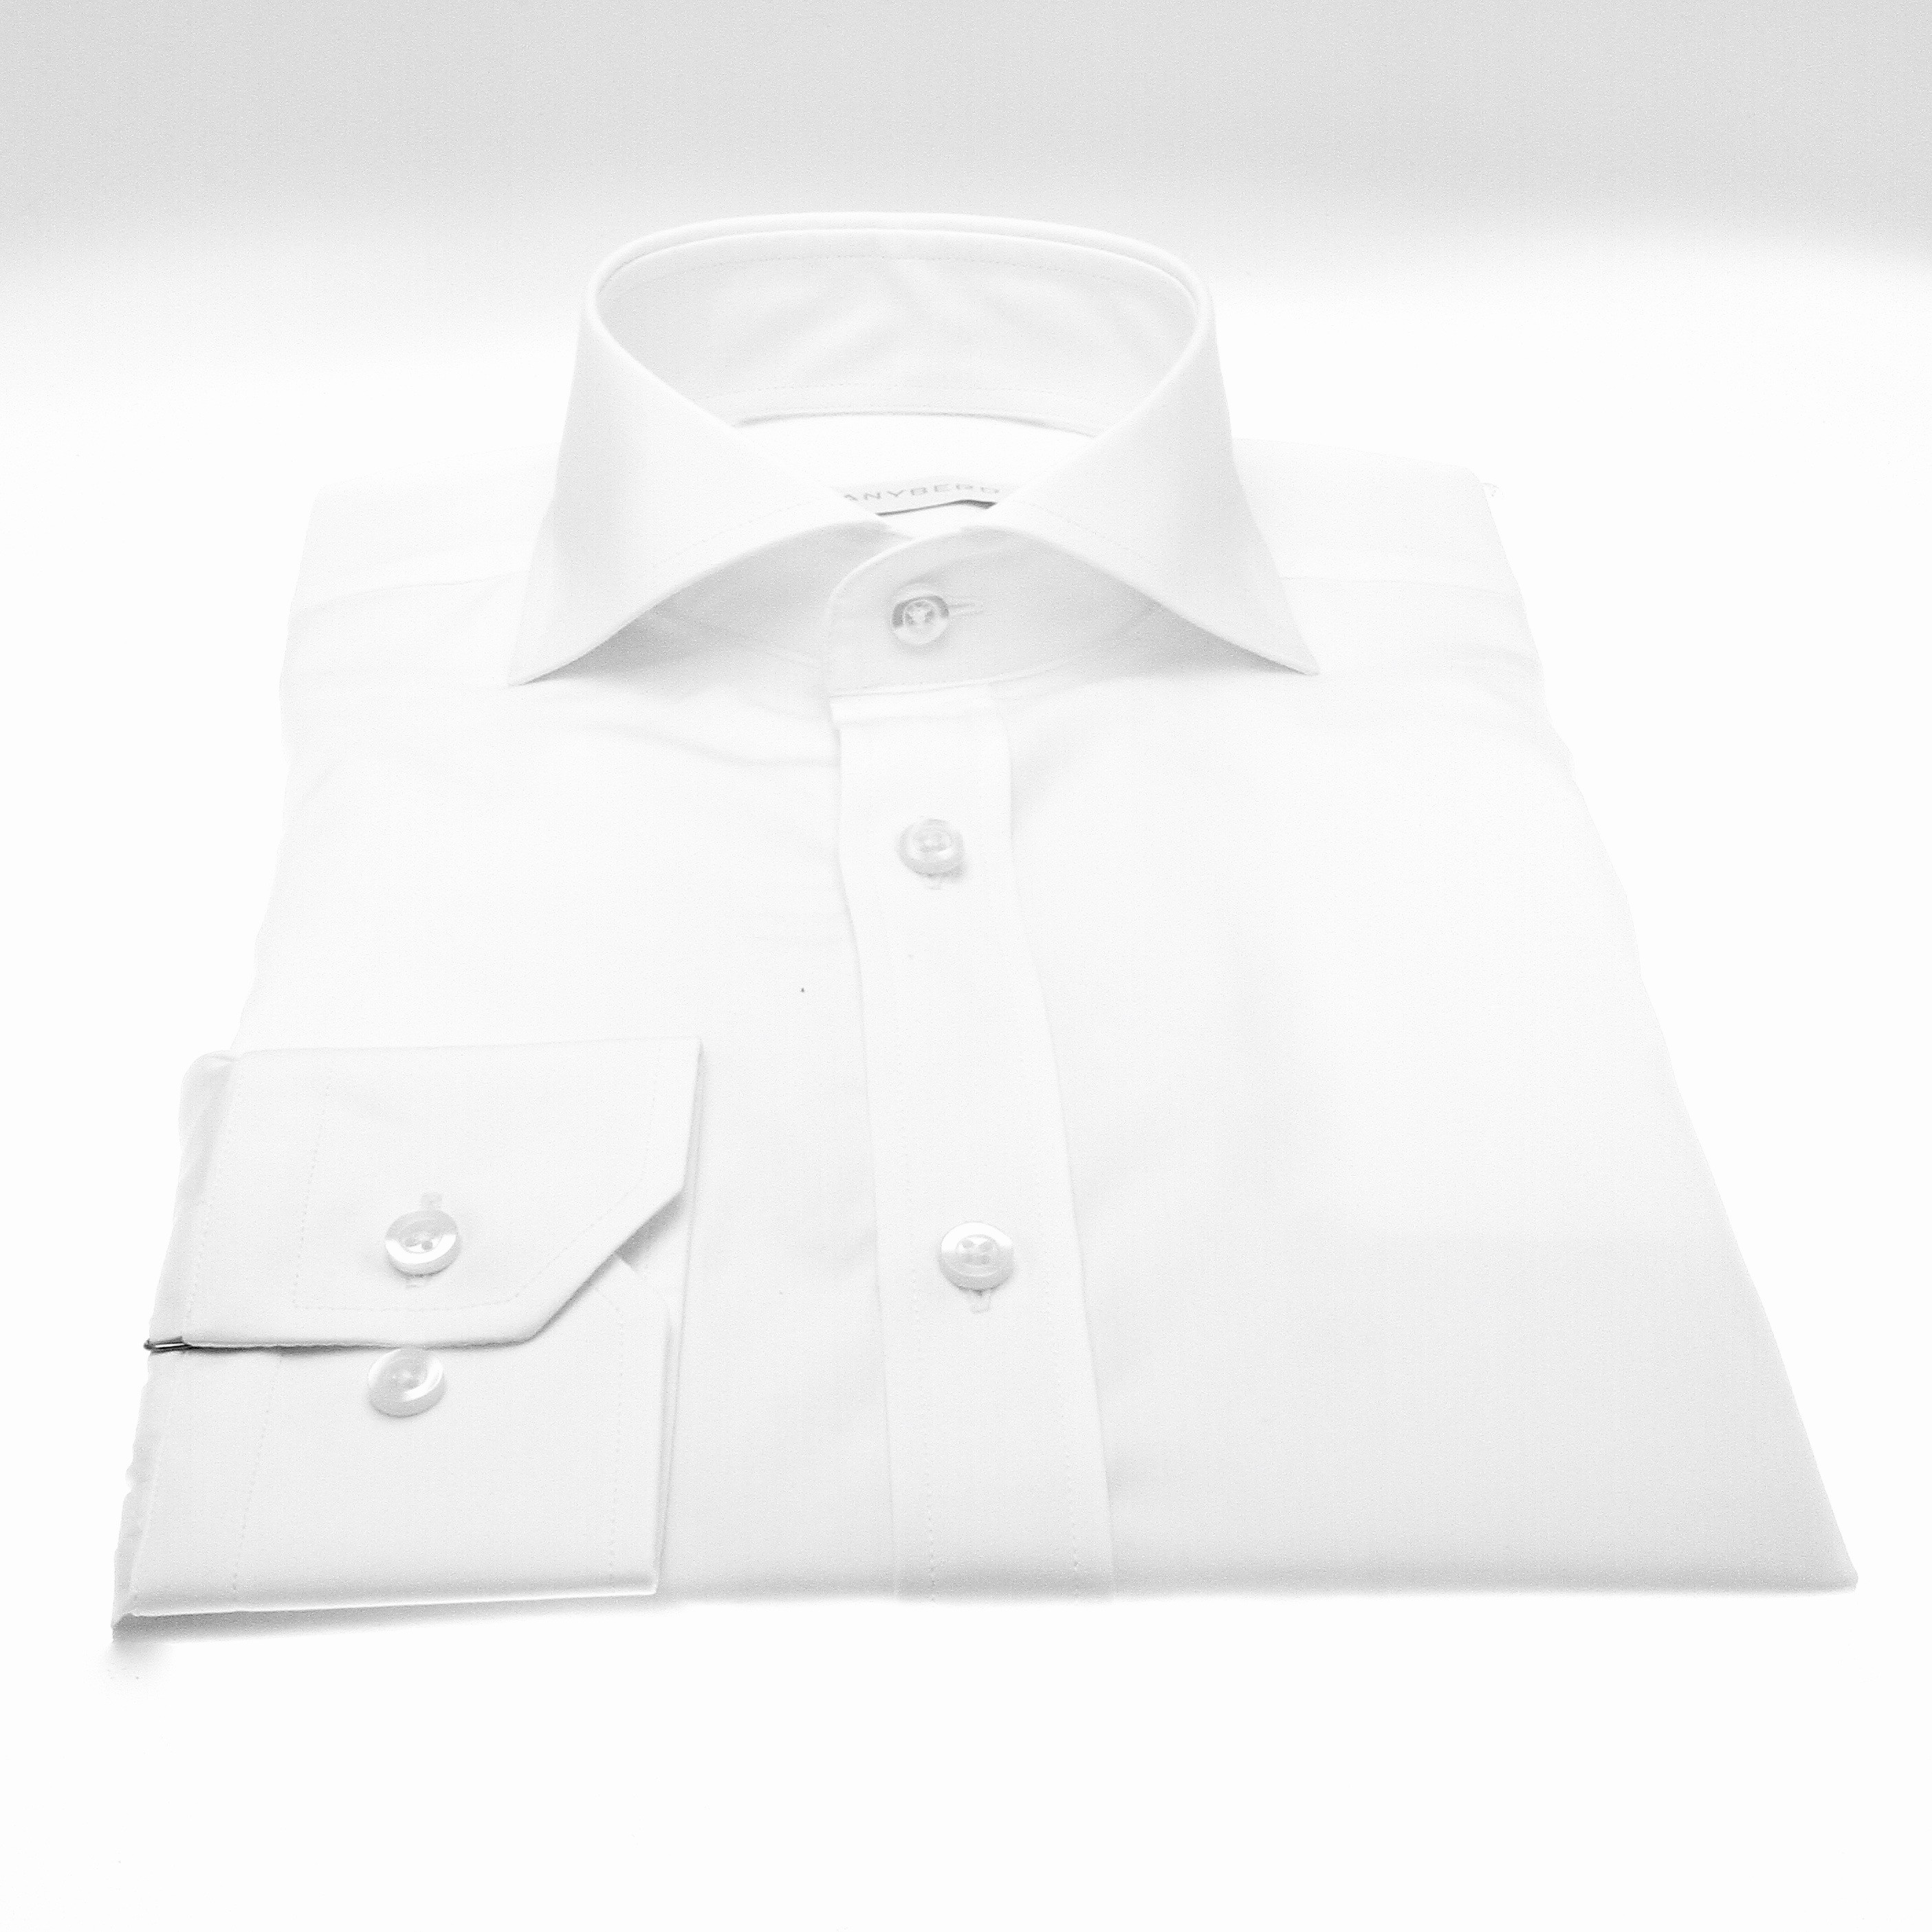 Chemise Reims : blanche - Col Italien (ShirtsChemise Reims : Rayures - Slim-cut - Col Italien (Shirts